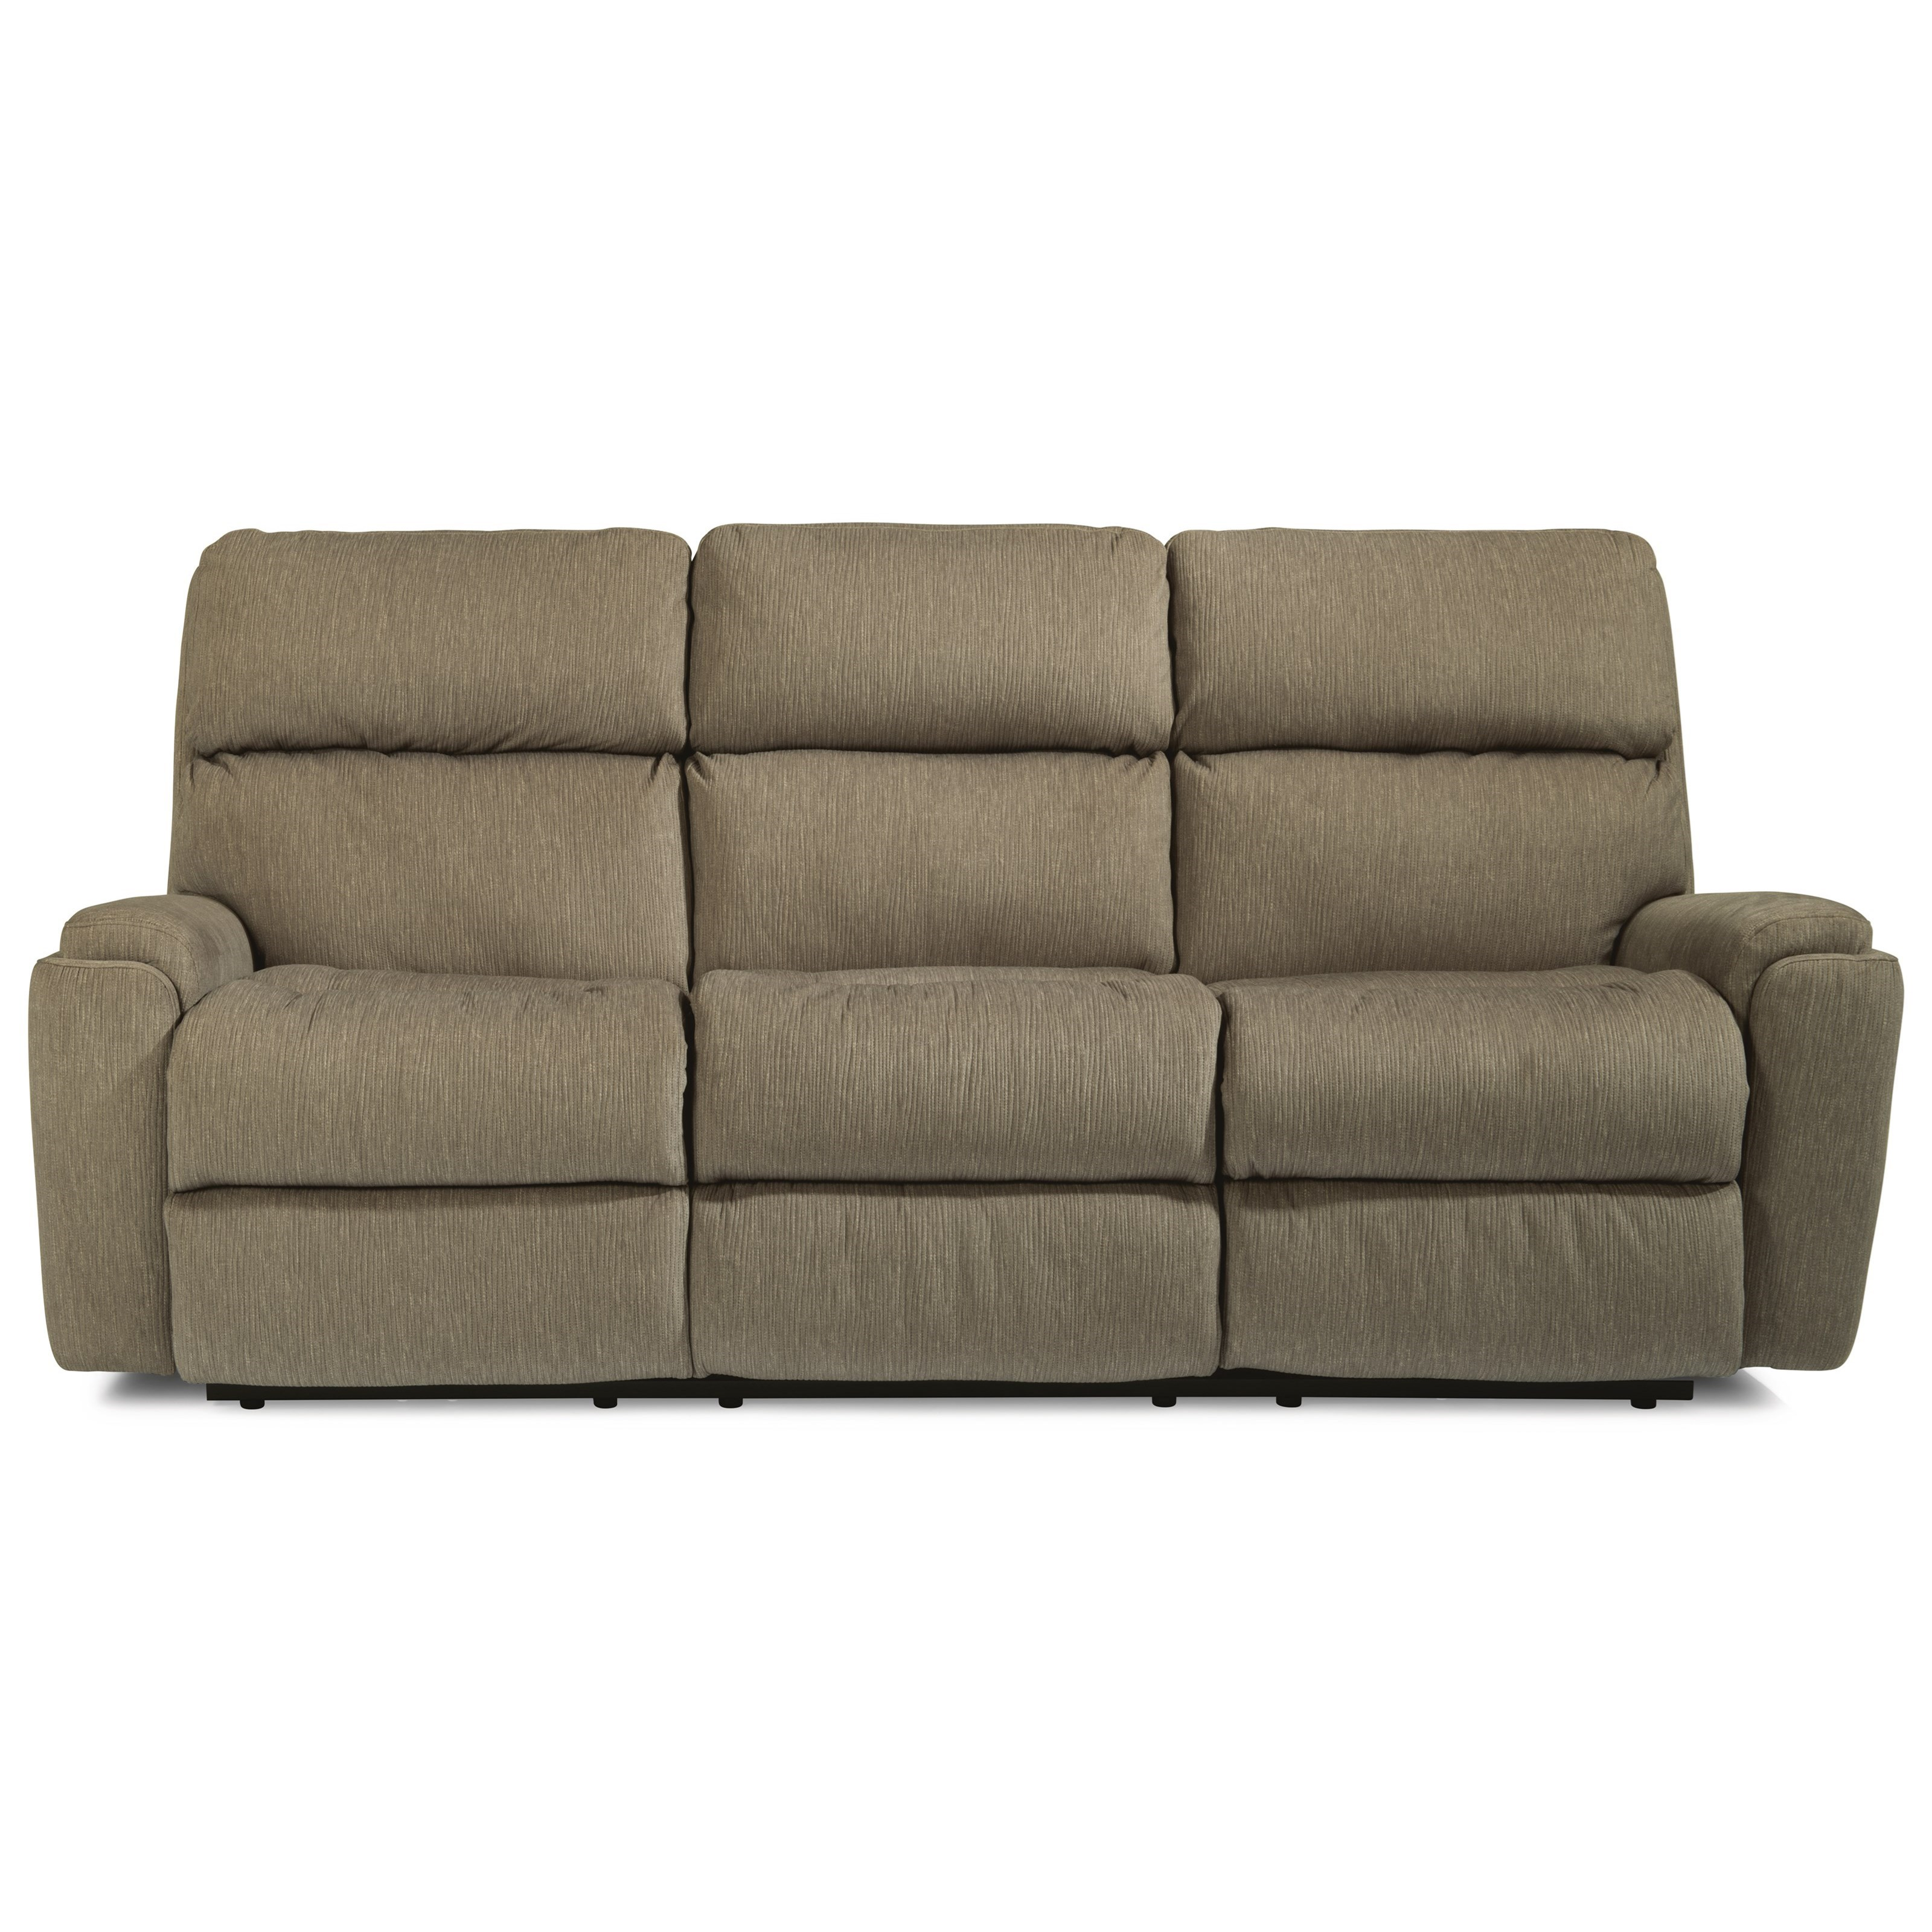 Rio Power Reclining Sofa by Flexsteel at Walker's Furniture